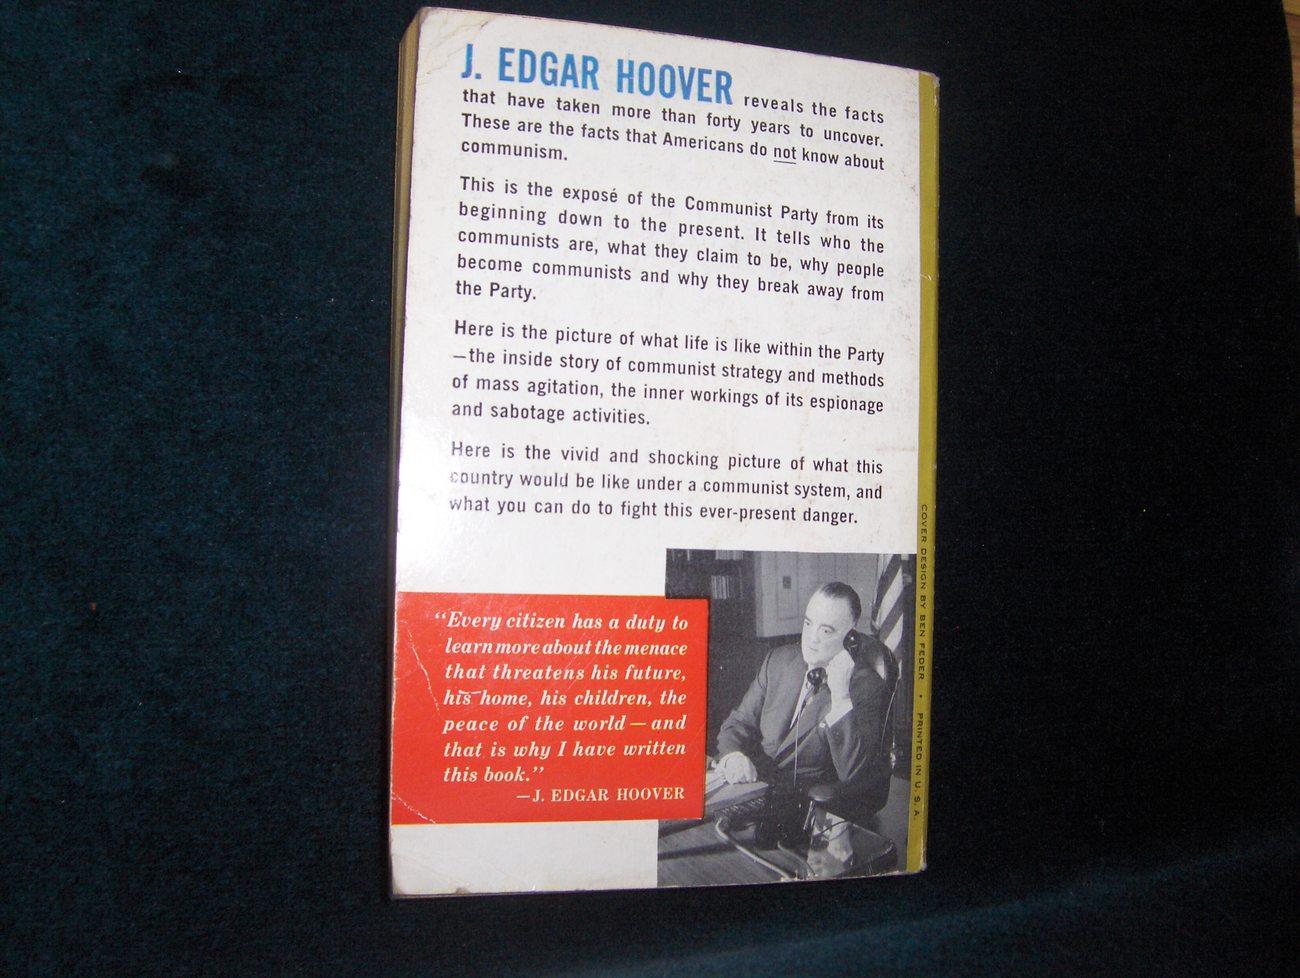 J. Edgar Hoover Masters of Deceit 1963